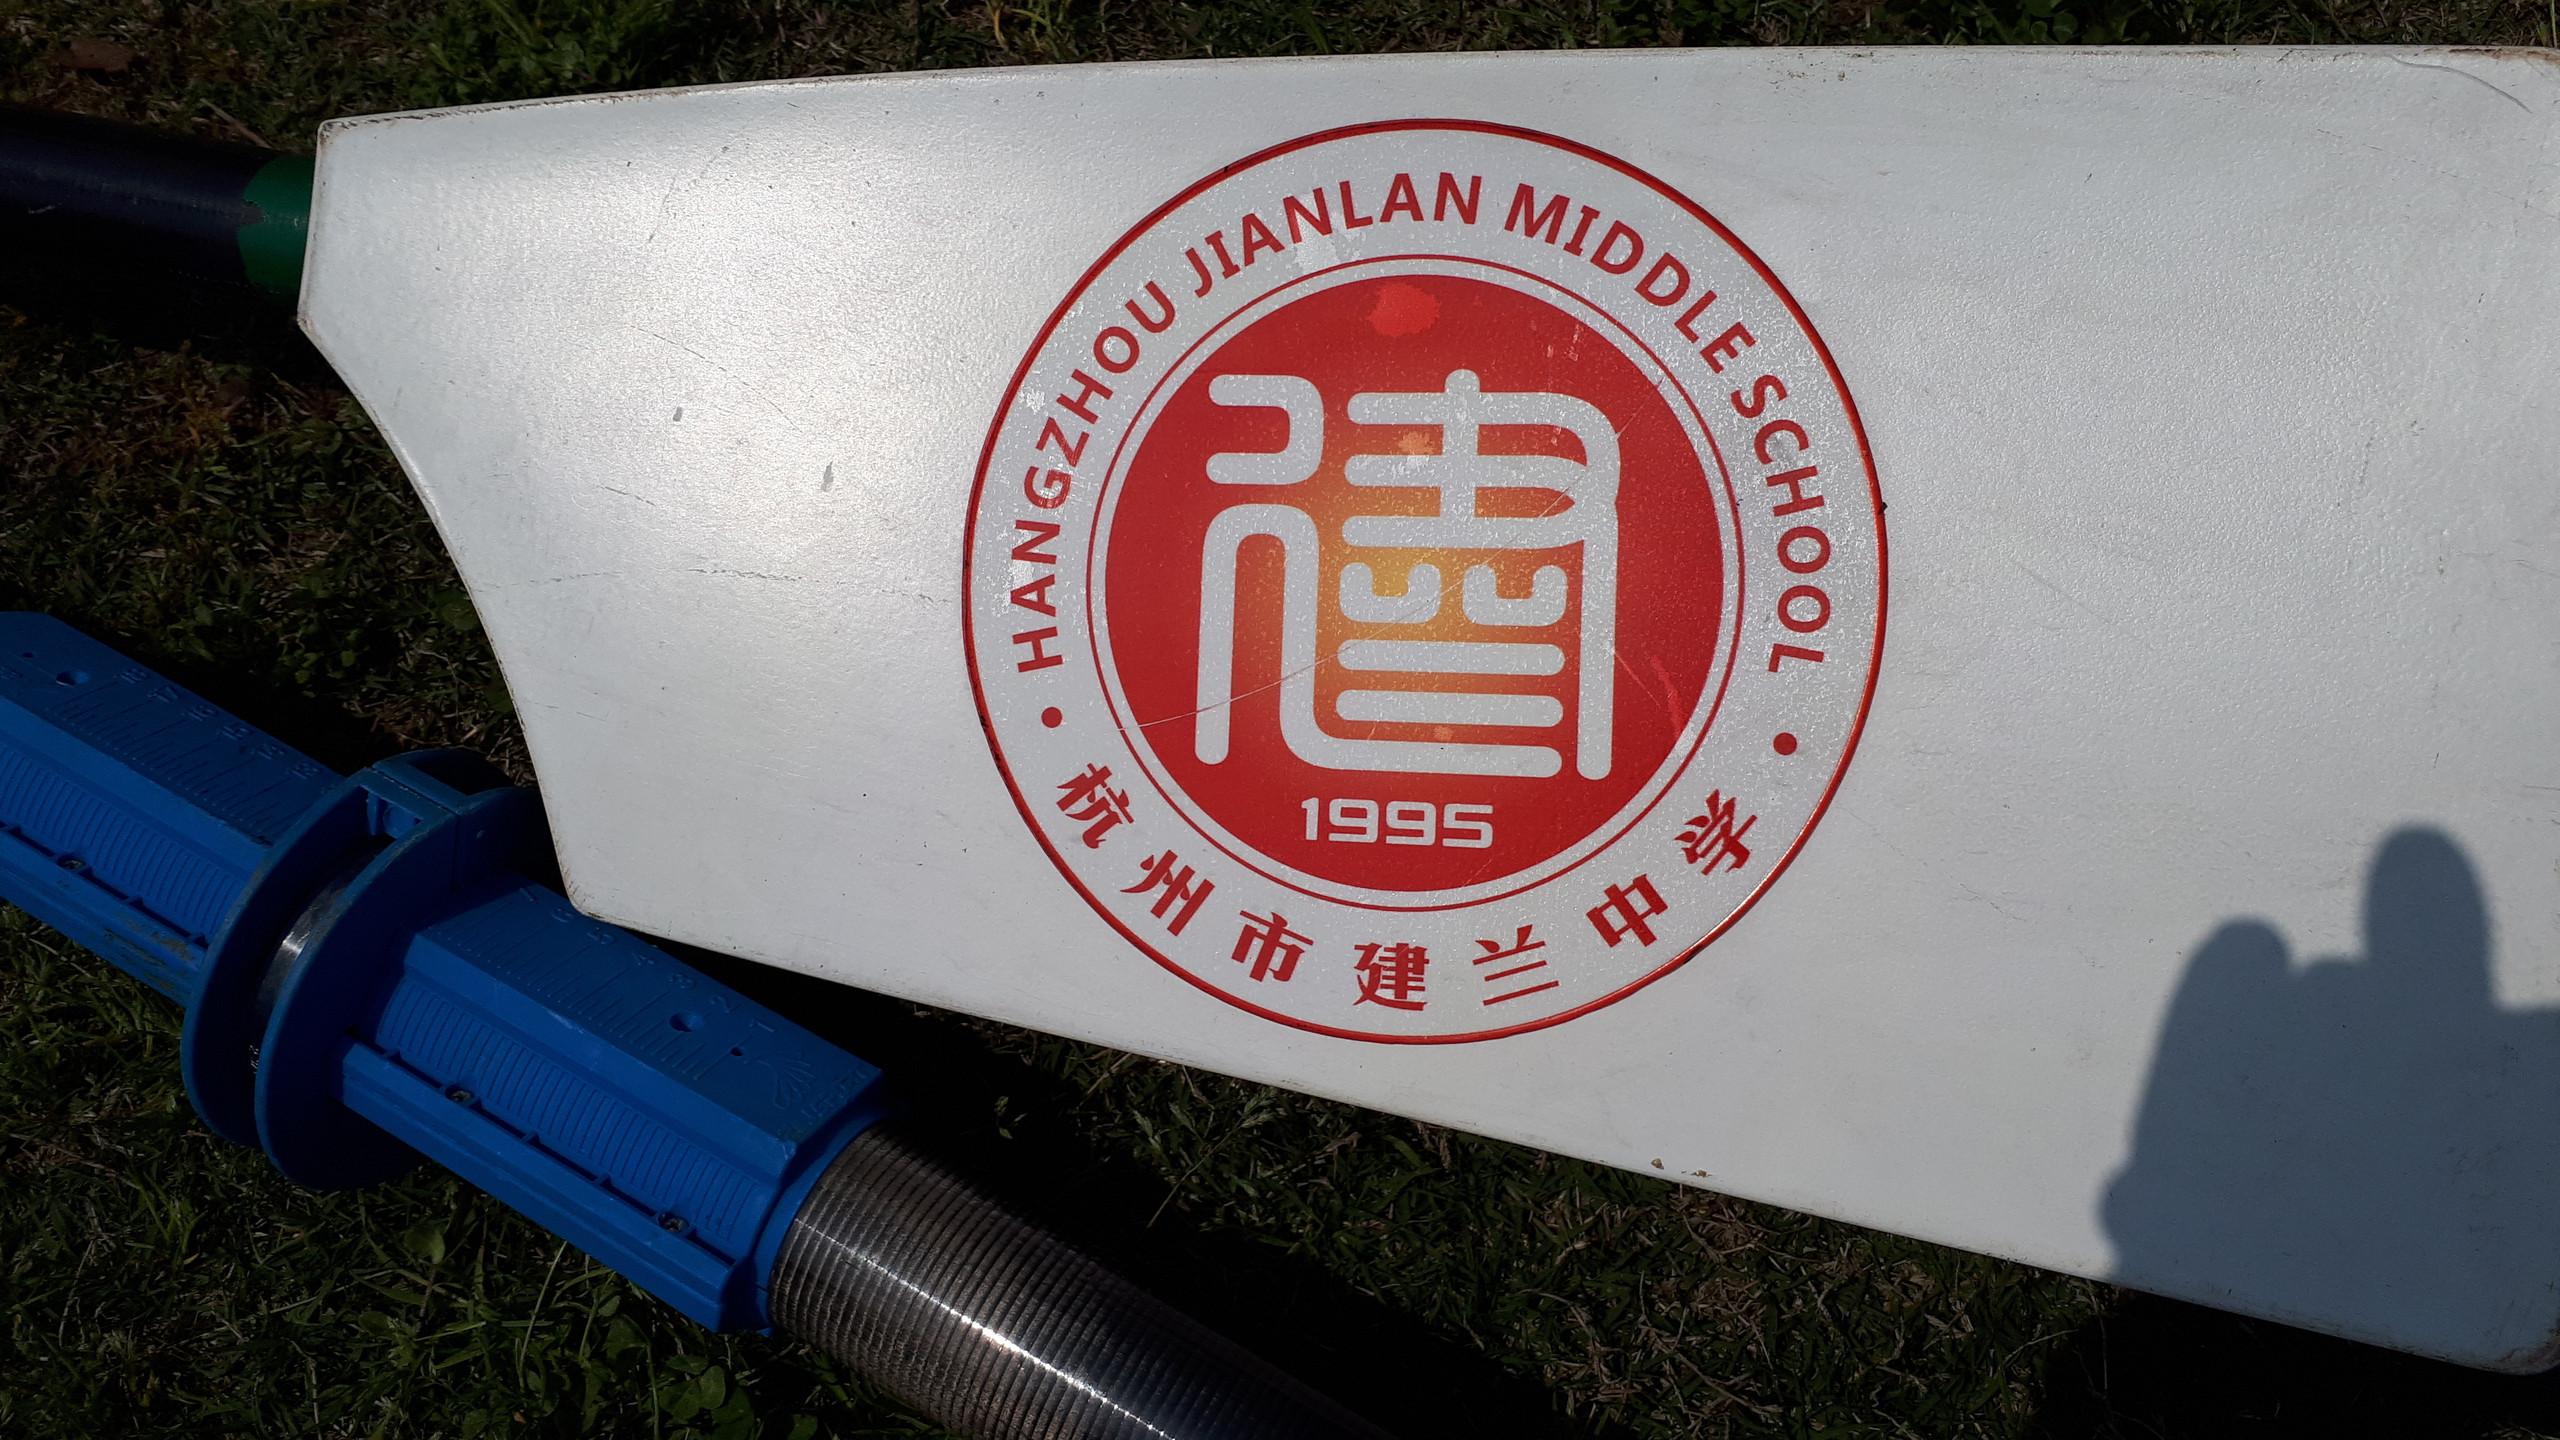 The school crest.